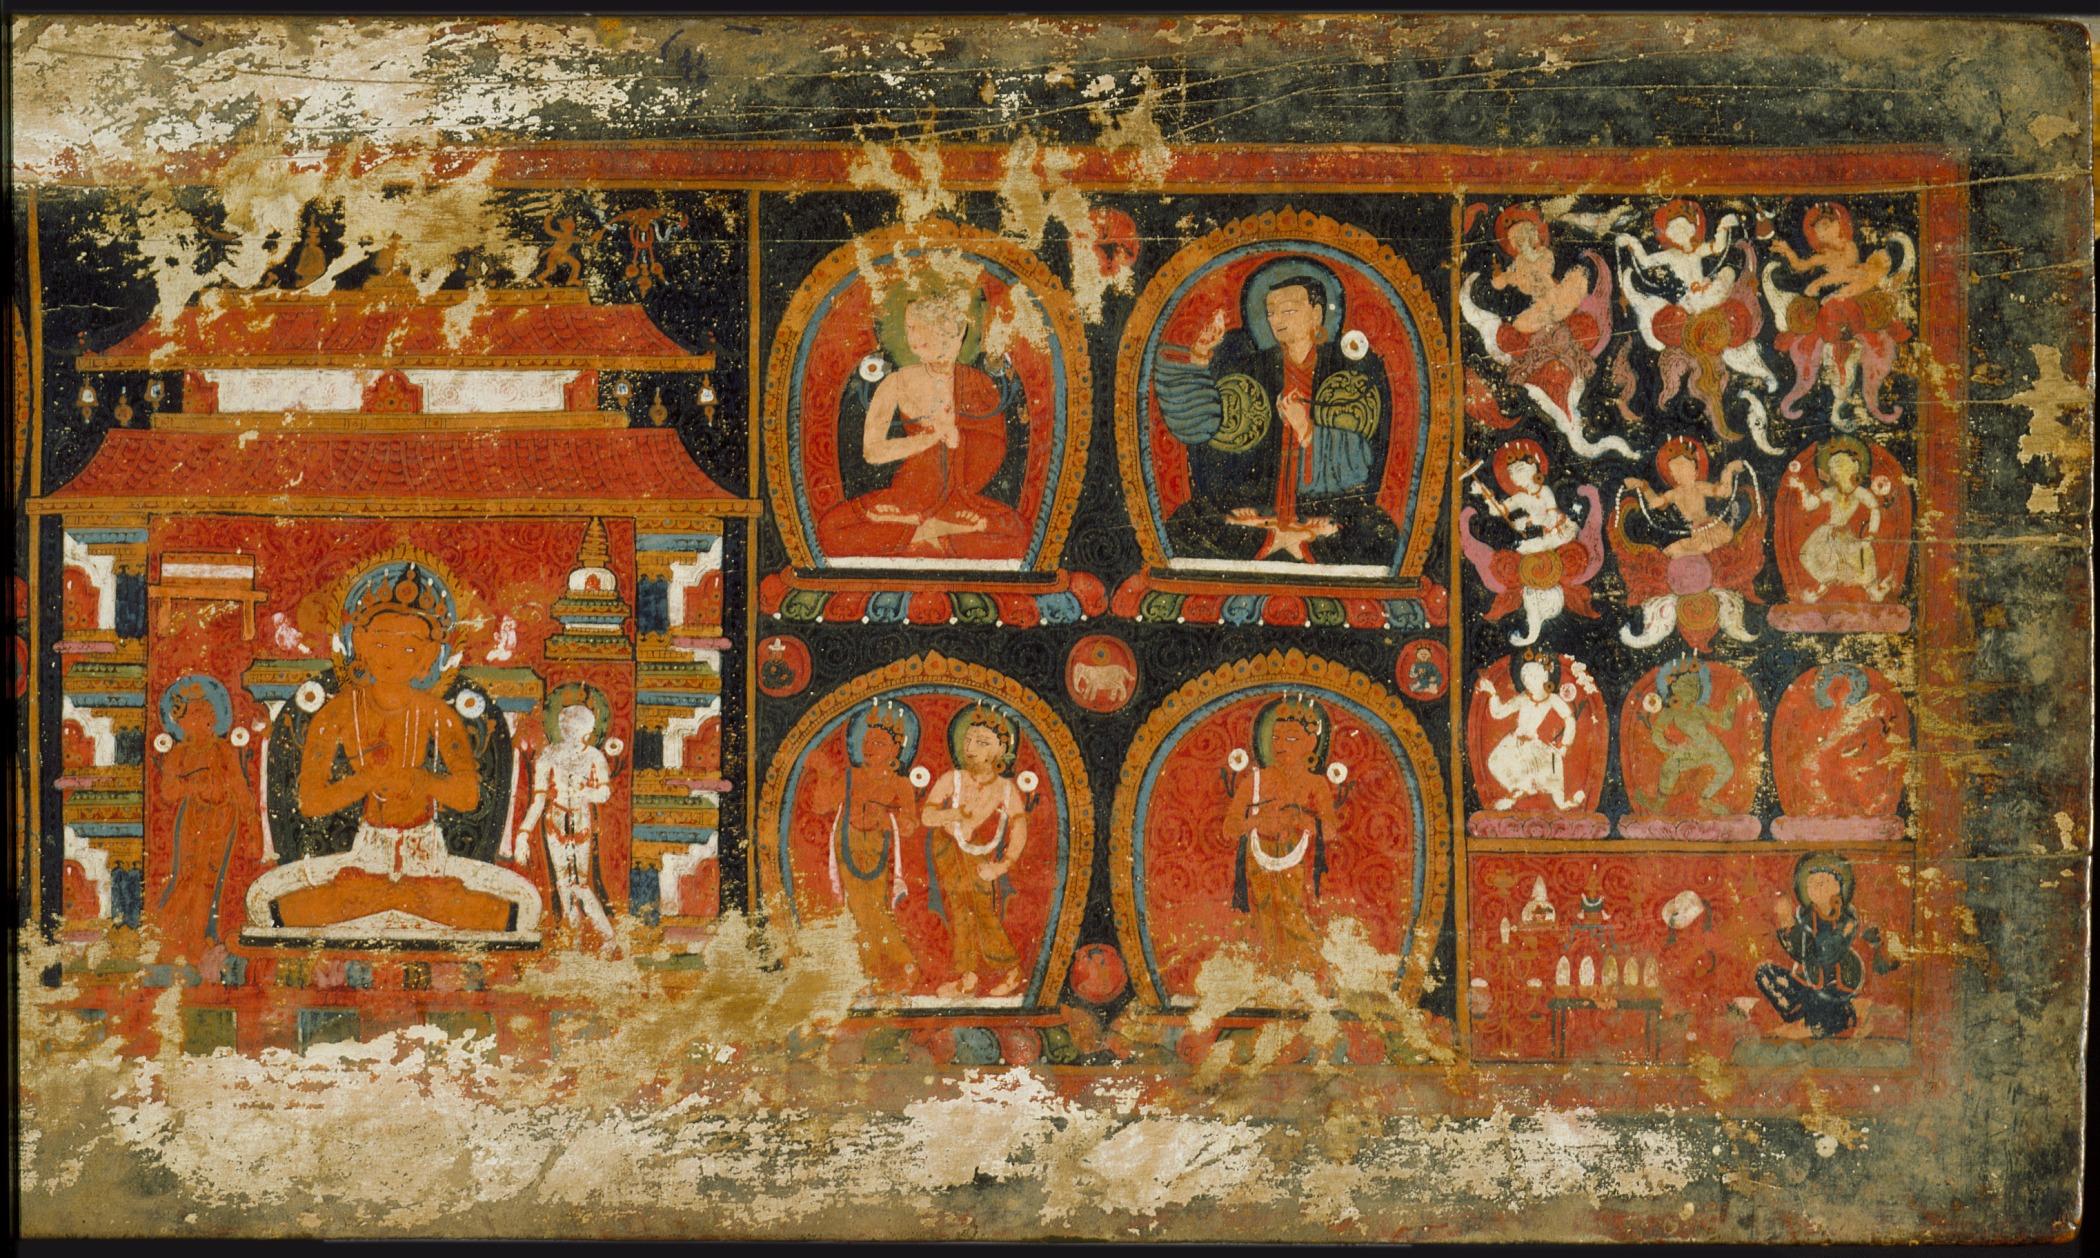 Enshrined Manjushri with Monks and Deities, Cover of a Prajnaparamita (The Perfection of Wisdom) Sutra